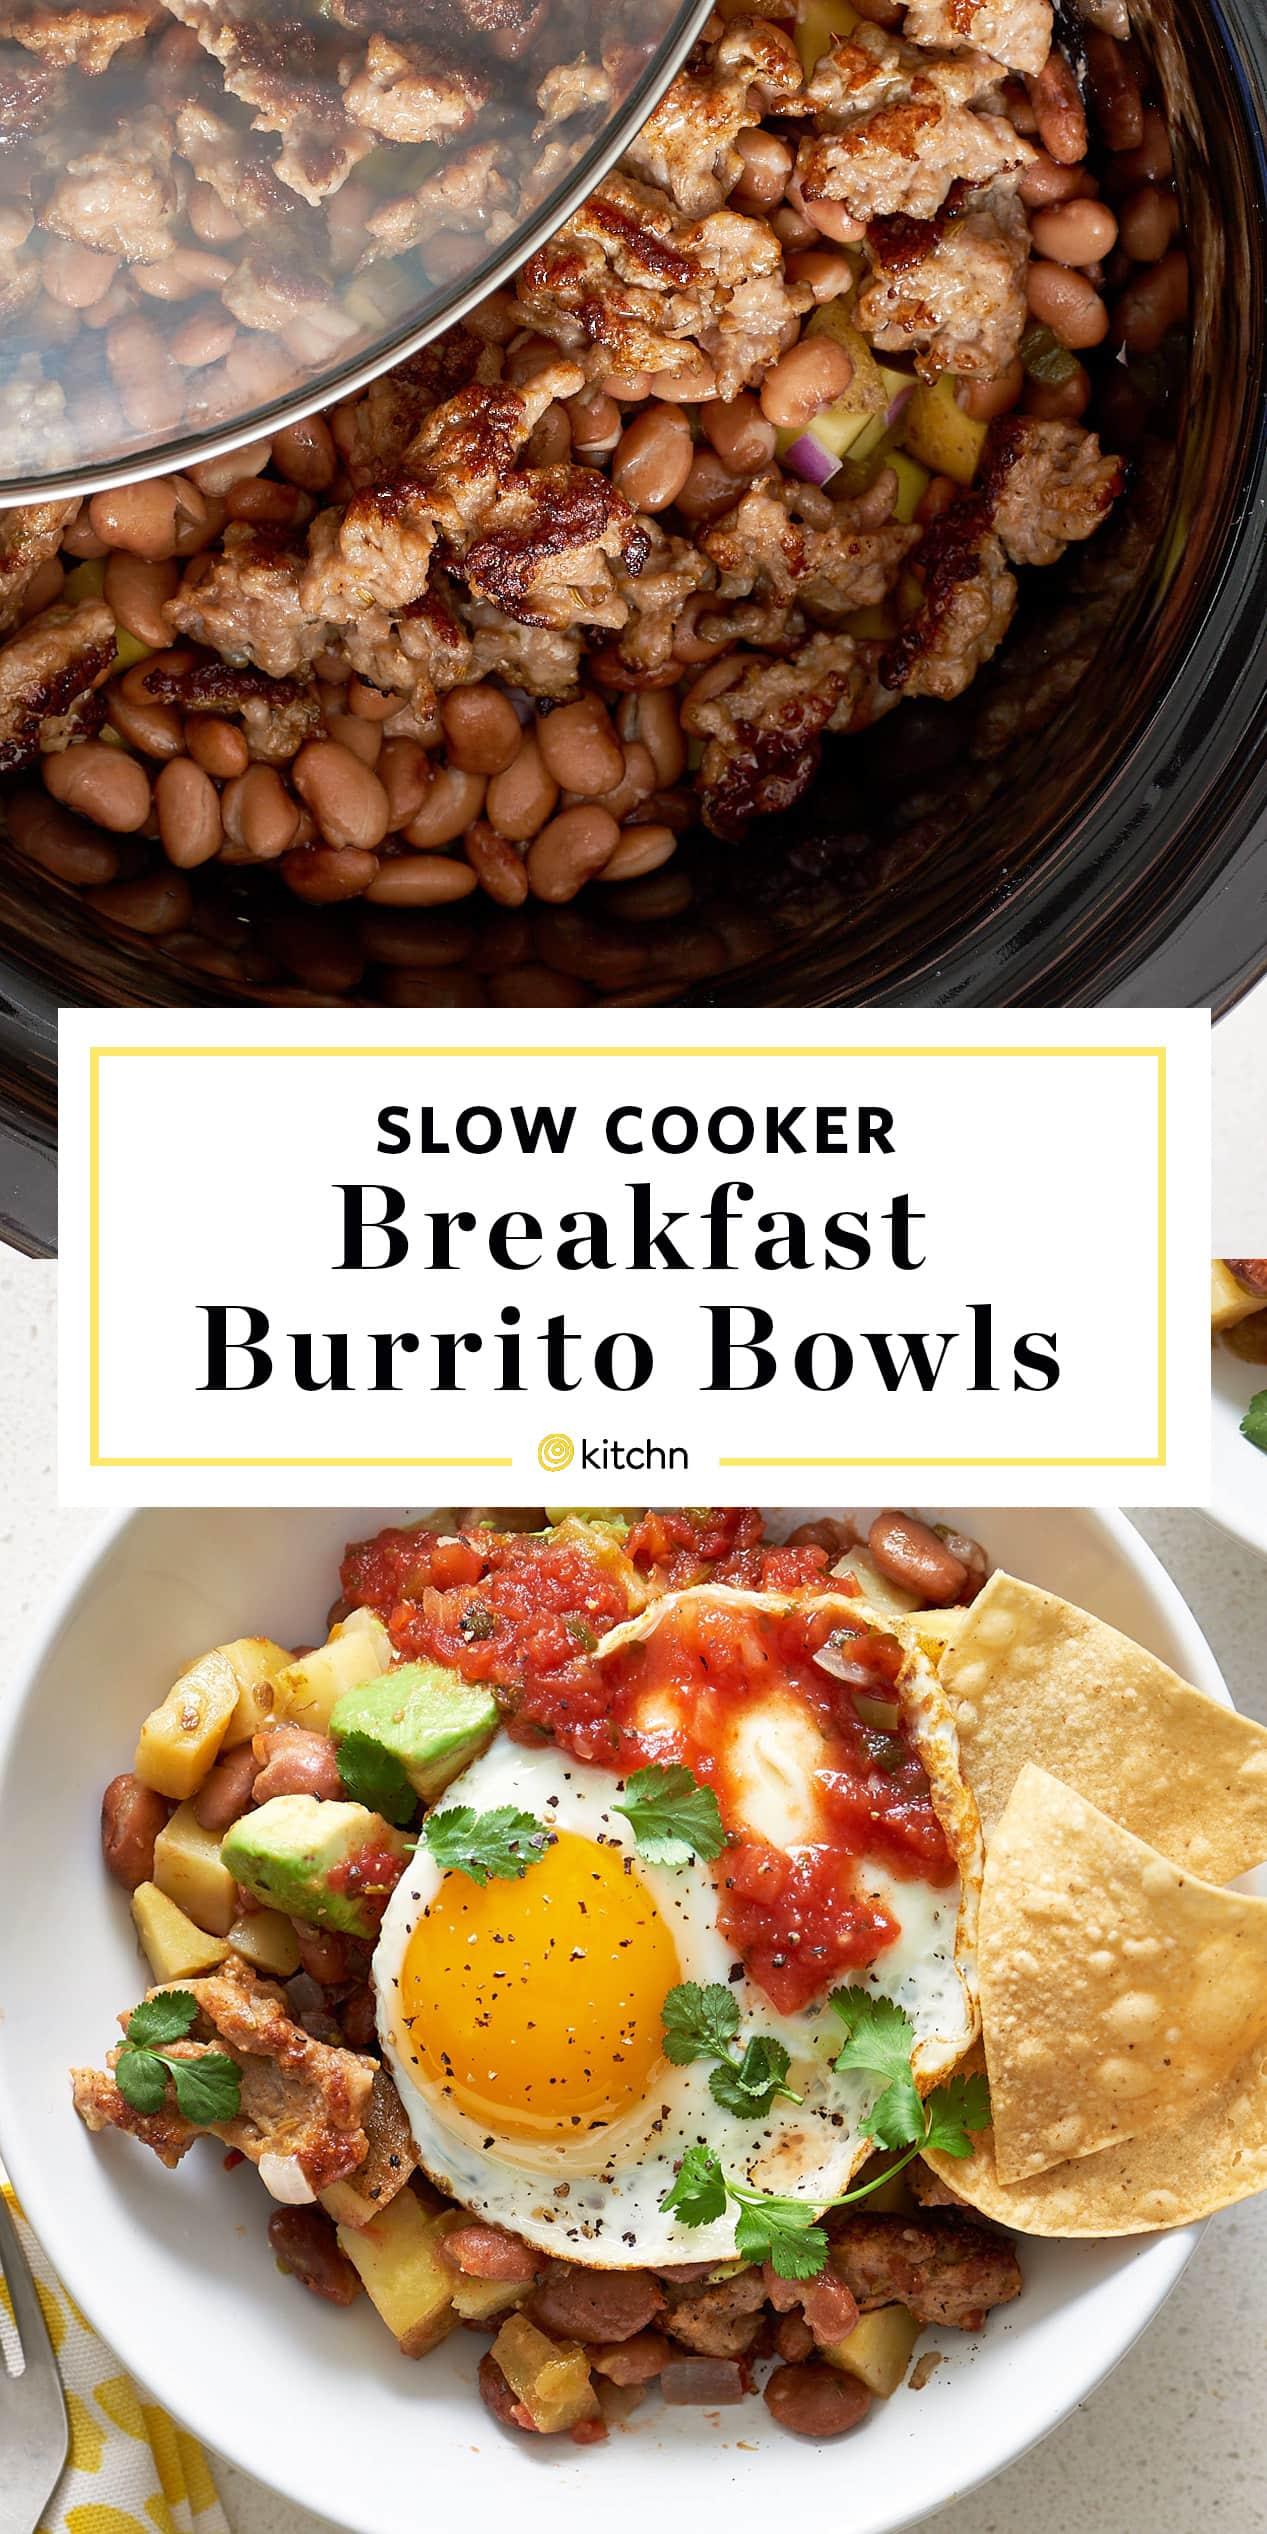 Slow Cooker Breakfast Burrito Bowls Recipe